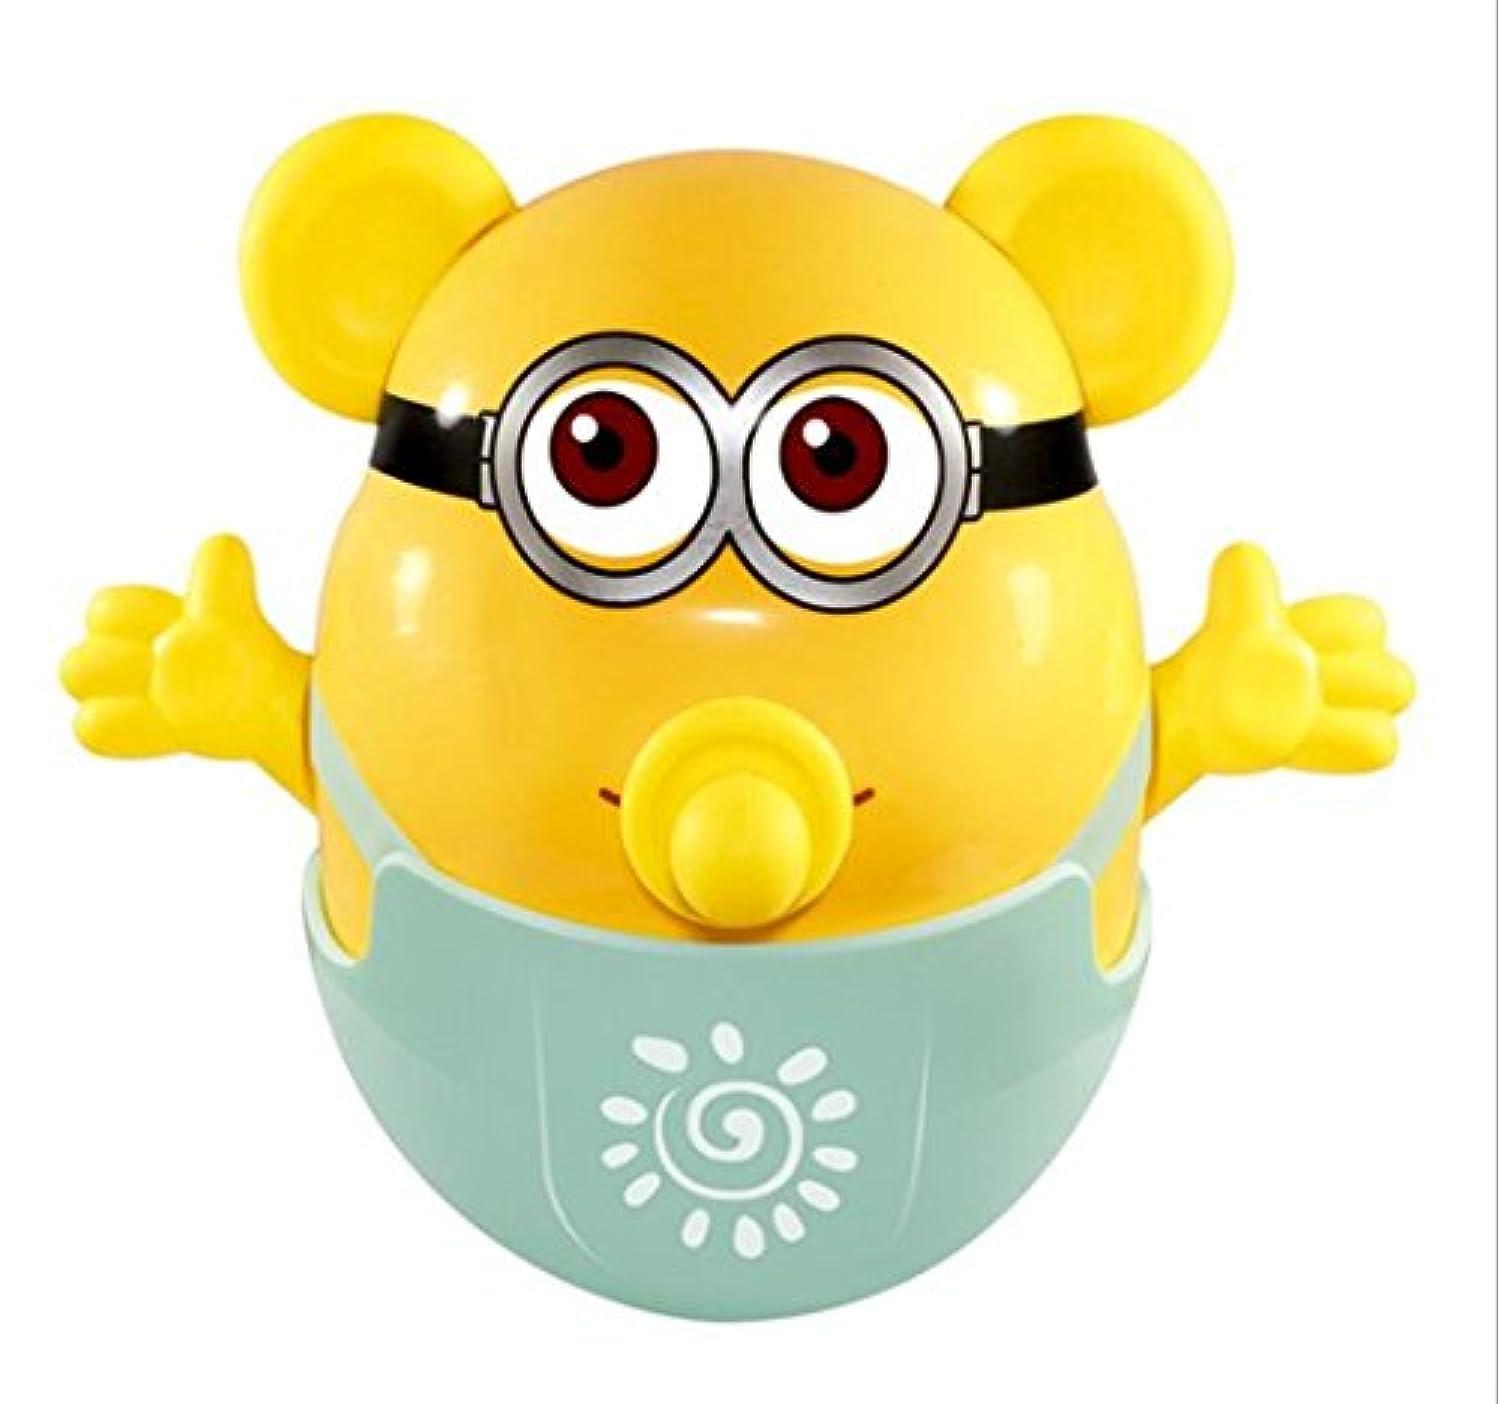 KEANER 新生児 乳児 ロールポリ おもちゃ 安全 歯固め ベビーシャワー ラトル タンブラー 知育玩具 (イエロー)